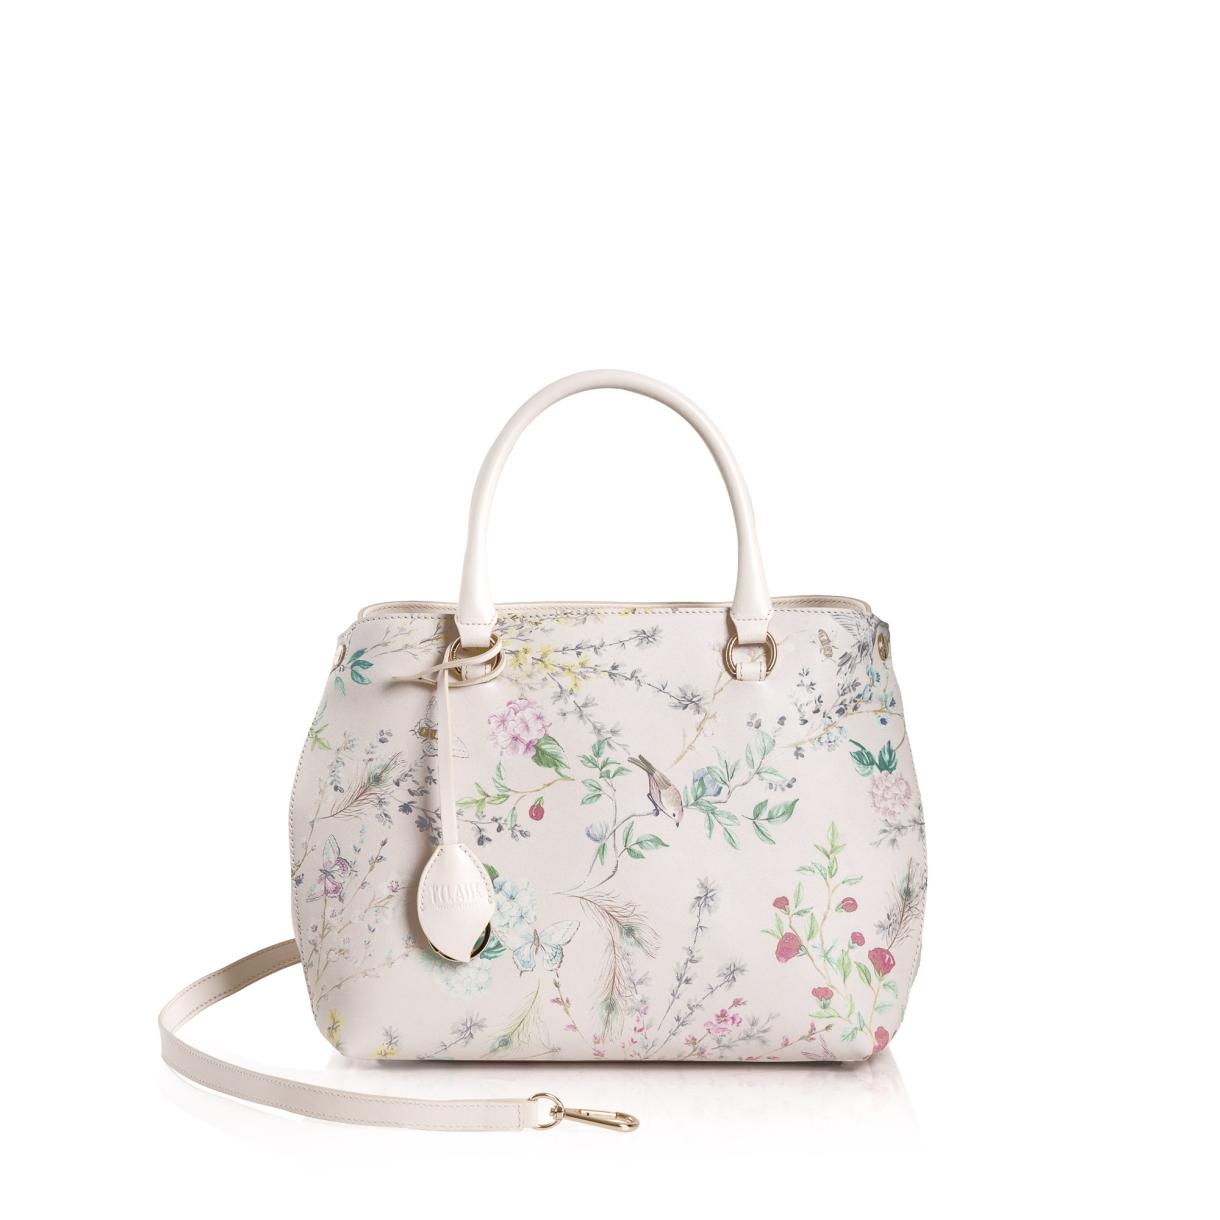 c89c1ba96fc Бяла чанта с природни мотиви - Seliton 10 Демо Магазин